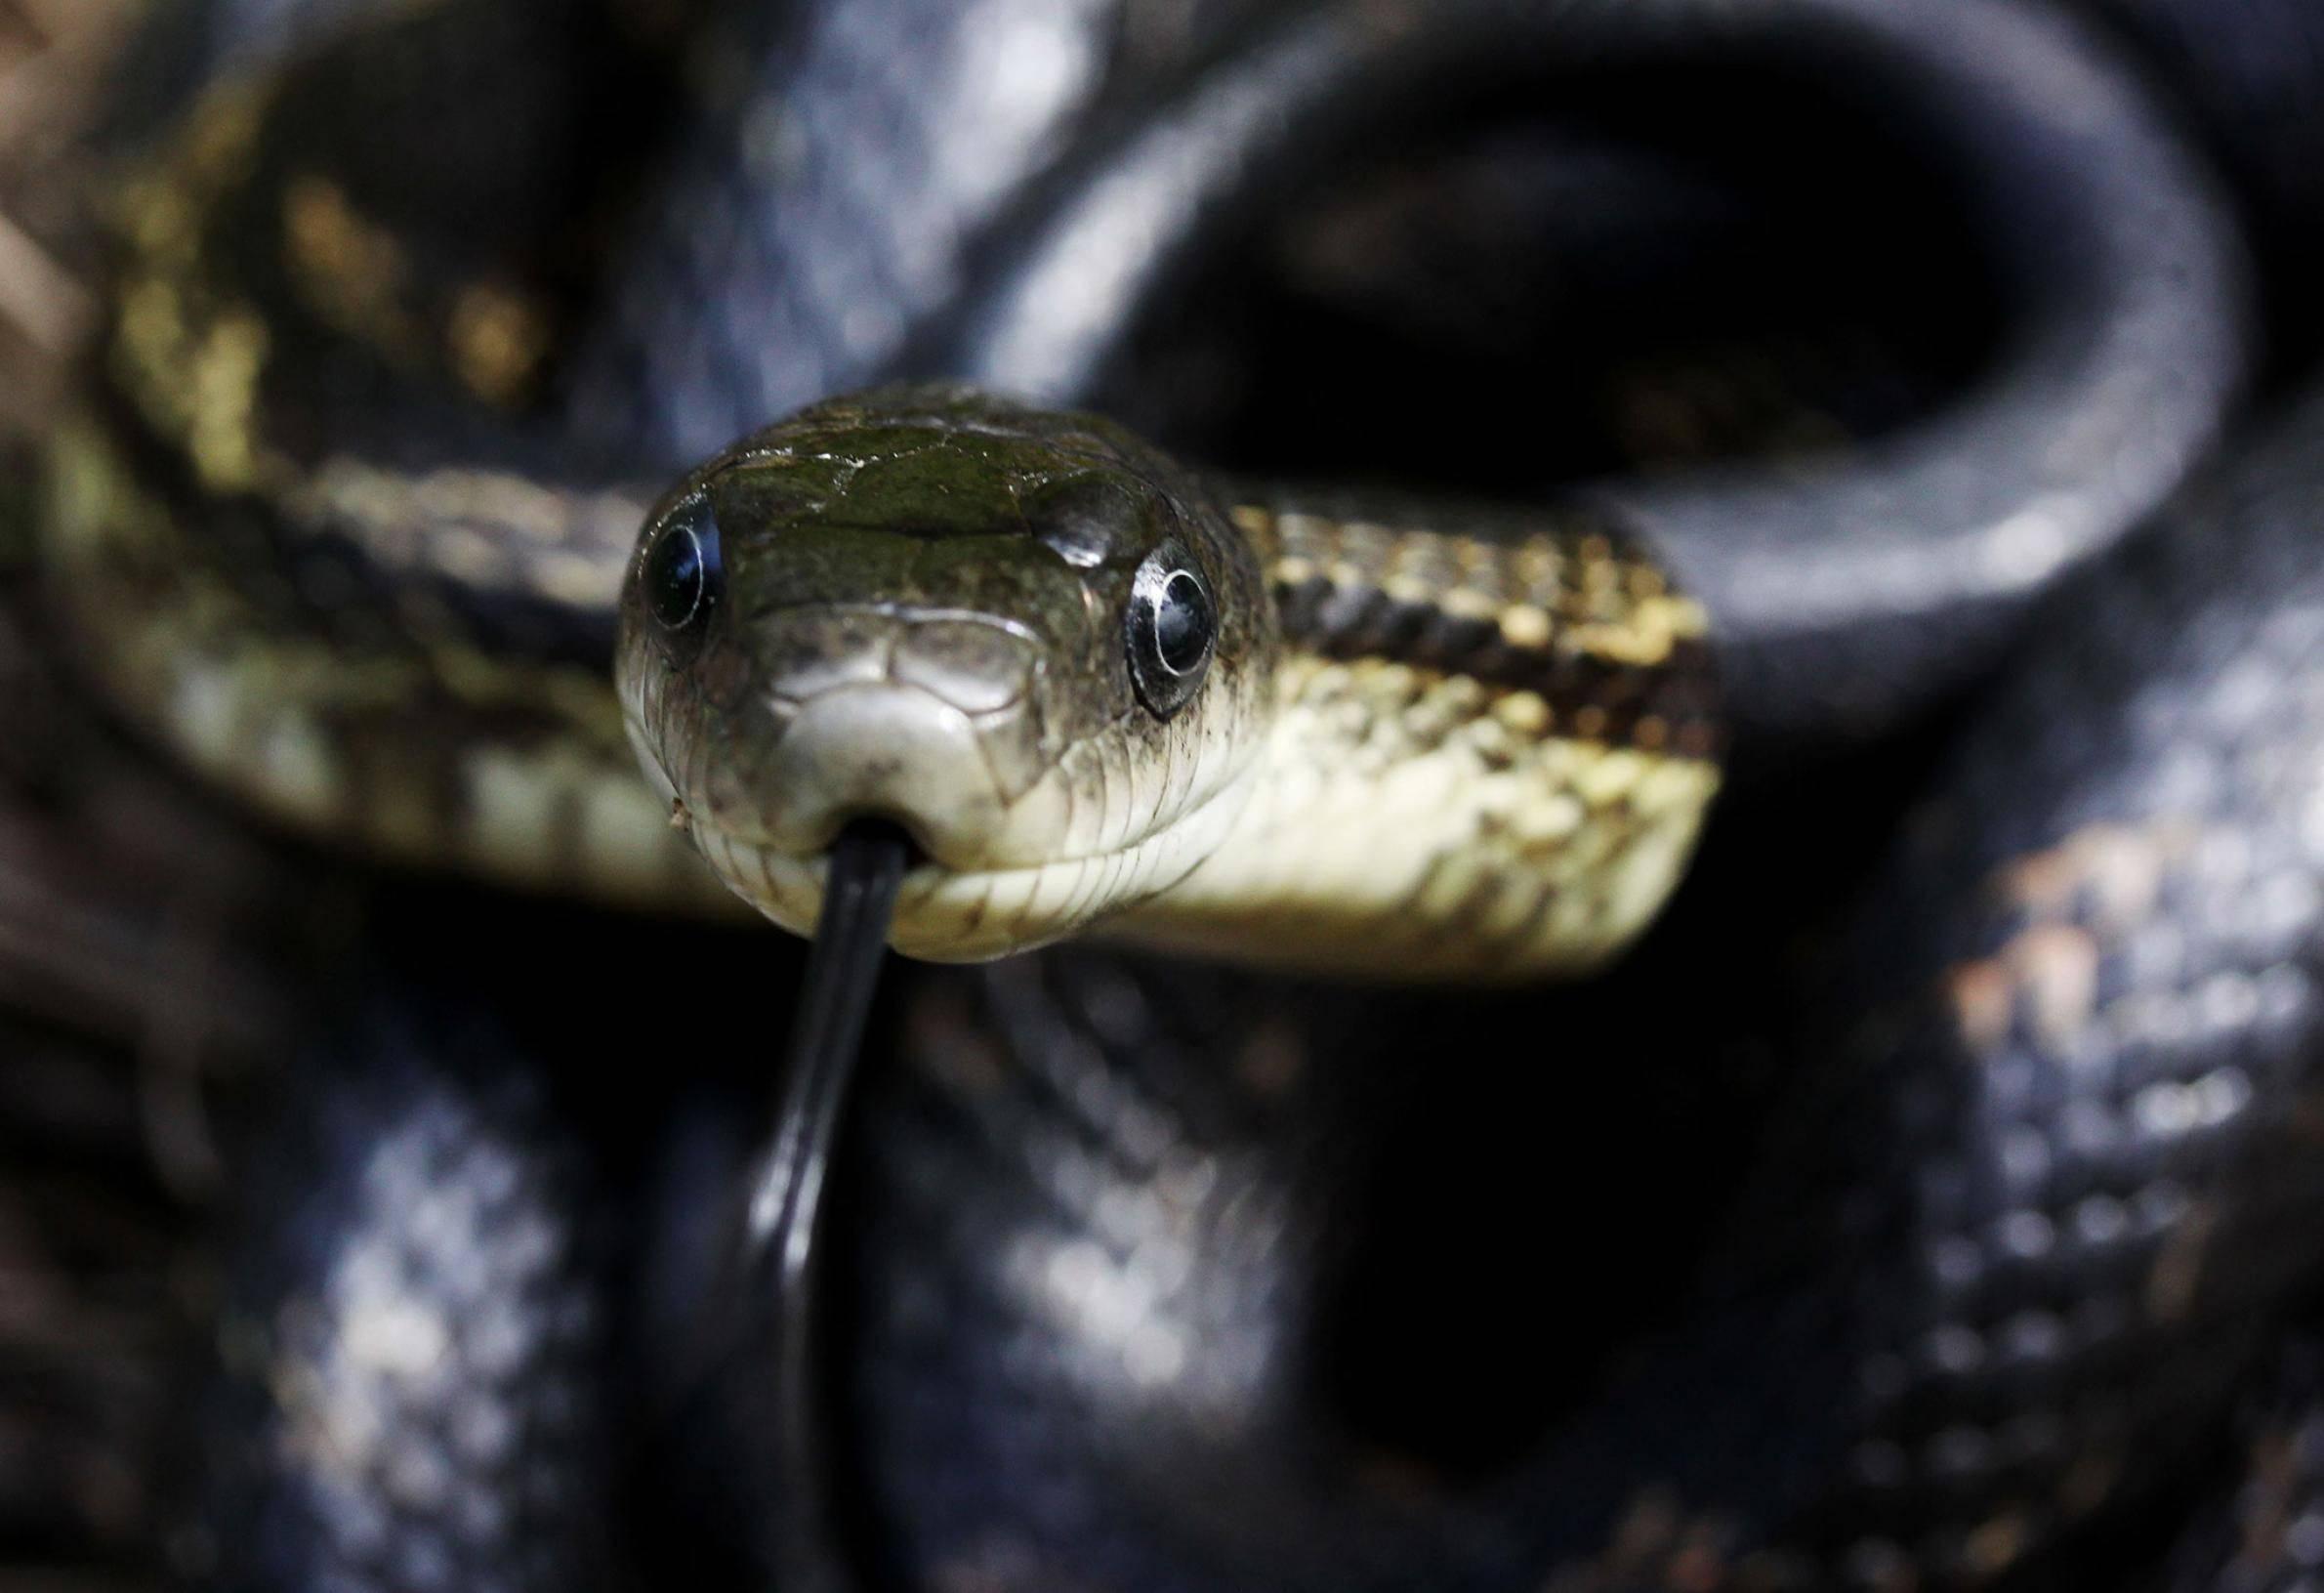 Сонник змеи смотрят. к чему снится змеи смотрят видеть во сне - сонник дома солнца